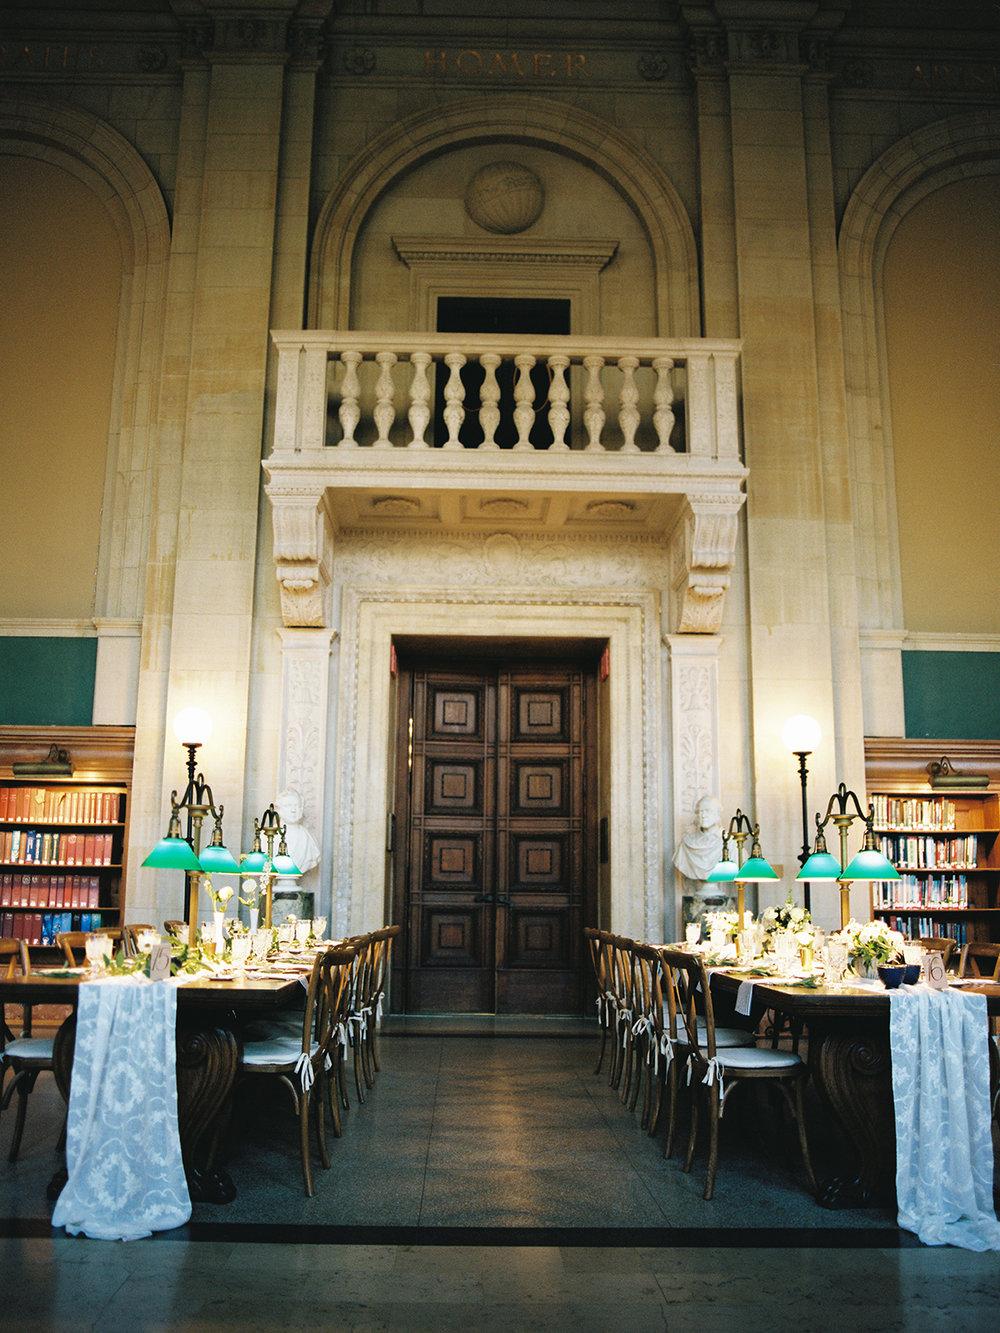 383-andrew-megan-boston-public-library-wedding-film-photographer.jpg